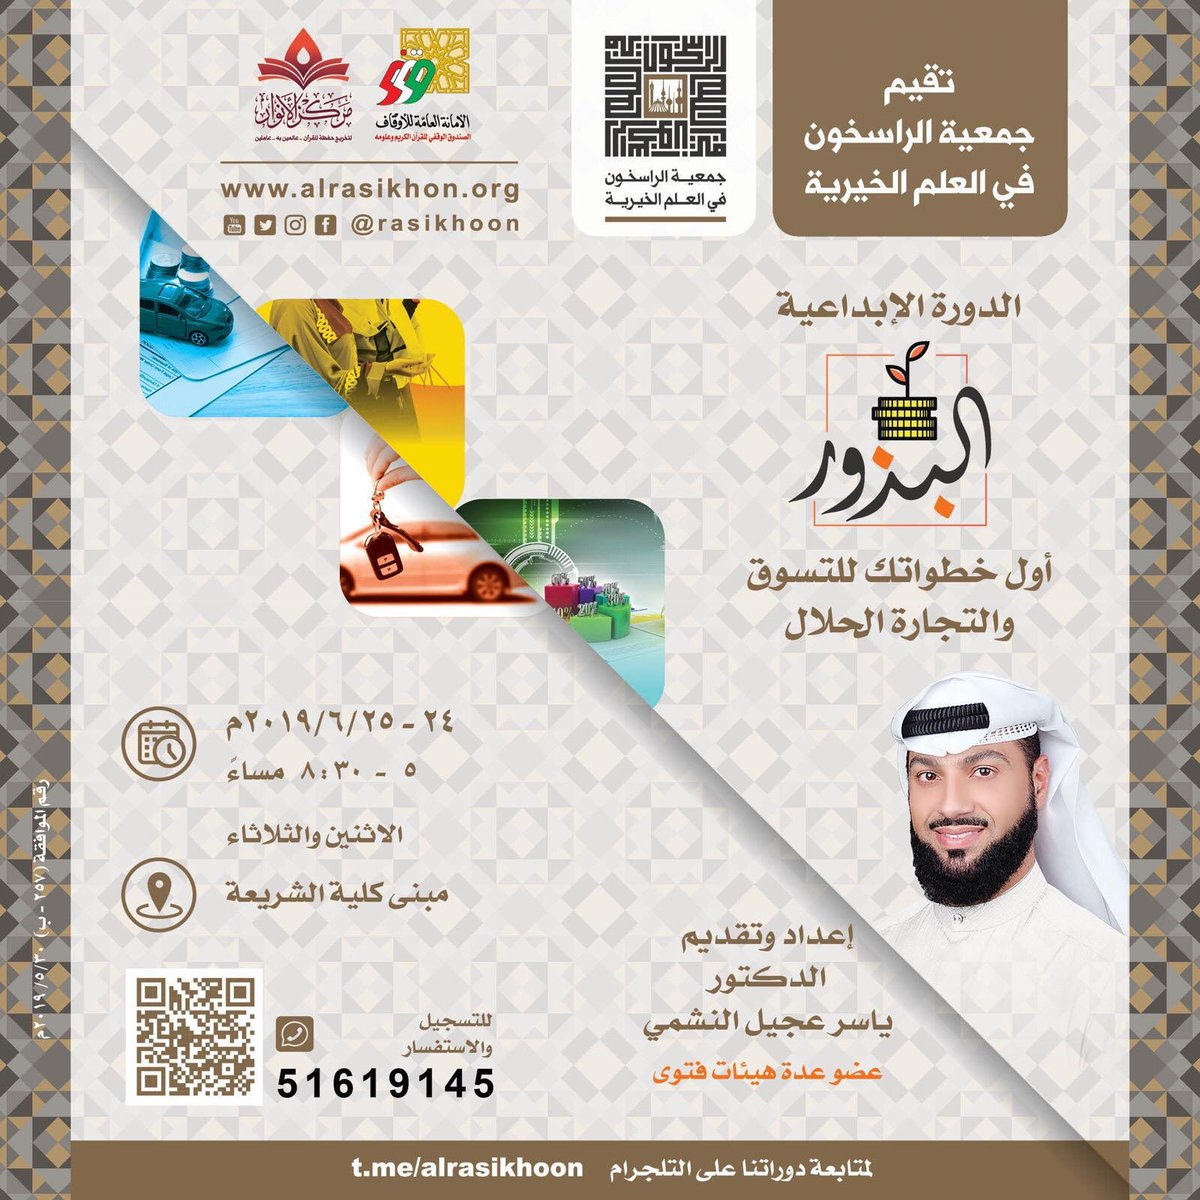 e772b884a د. ياسر النشمي (@Yaser_Alnashmi) | Twitter